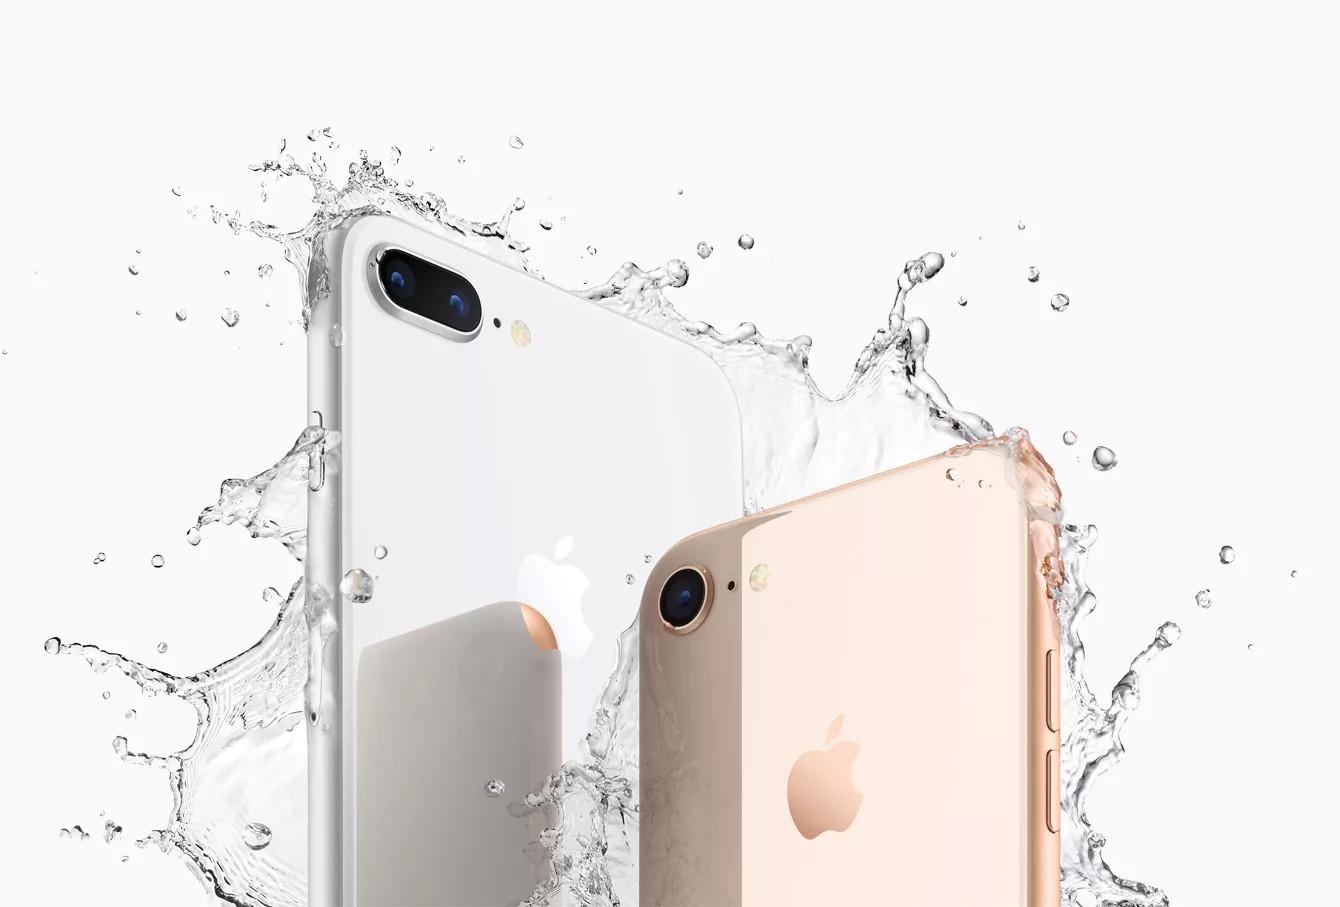 IPhone 8 Teardown - iFixit